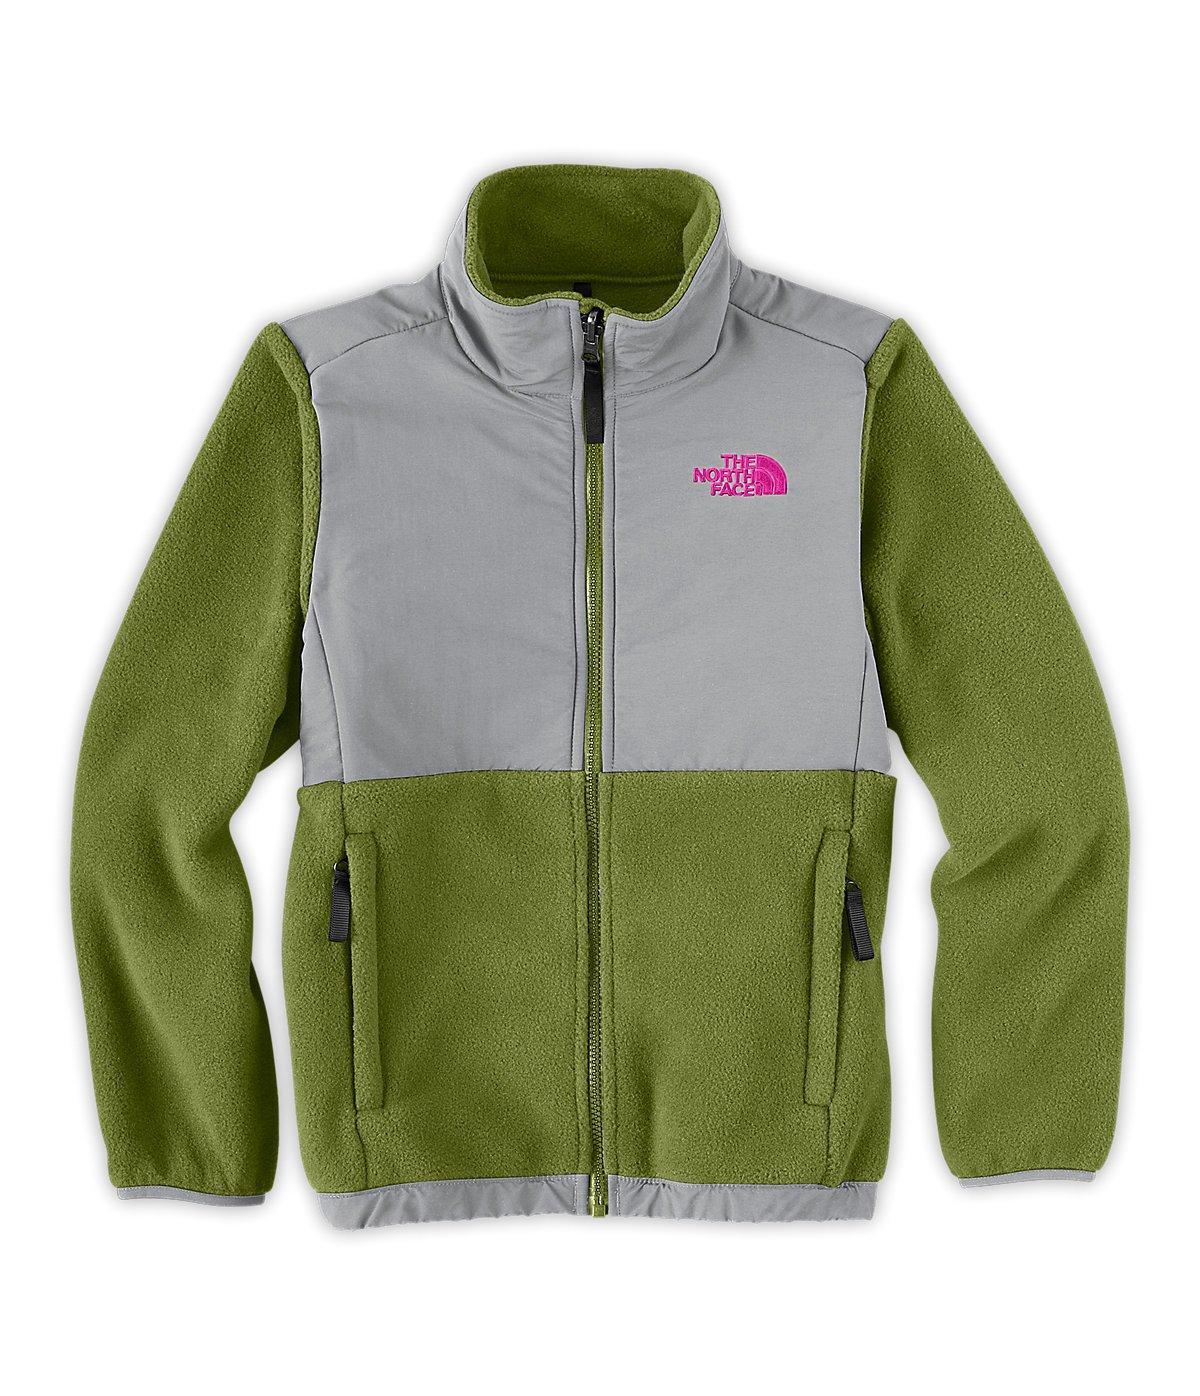 989b4807cda9 Amazon.com  The North Face Denali Jacket Girls   Clothing